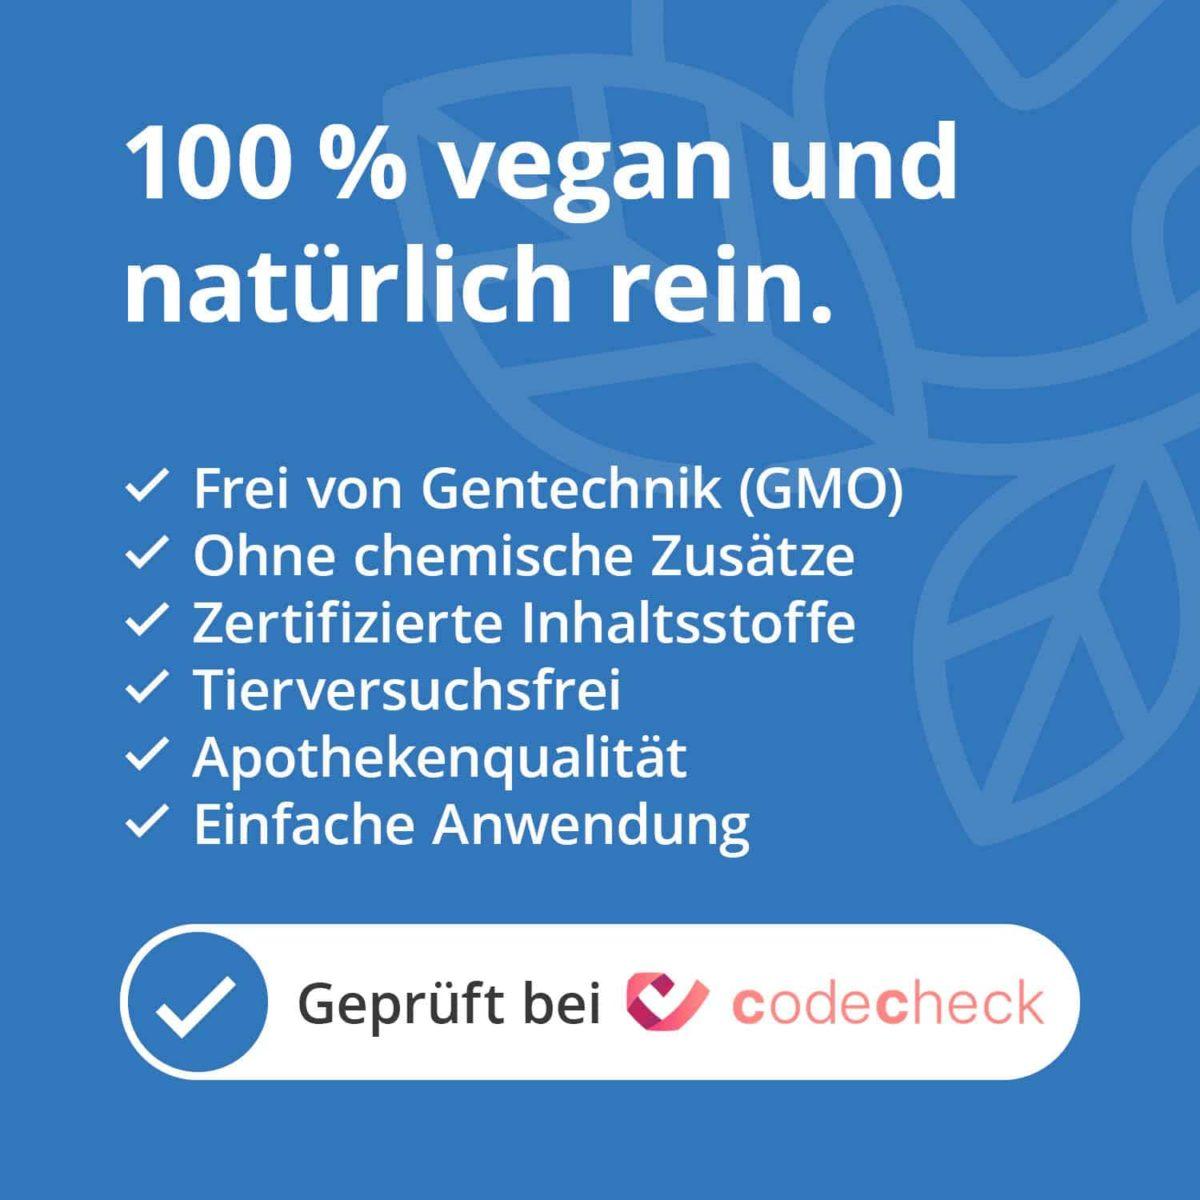 Casida Magnesiumchlorid Vitalbad Zechstein 1,0 kg 11615851 PZN Apotheke Muskelkater Sole Vollbad Fußbad Salz5